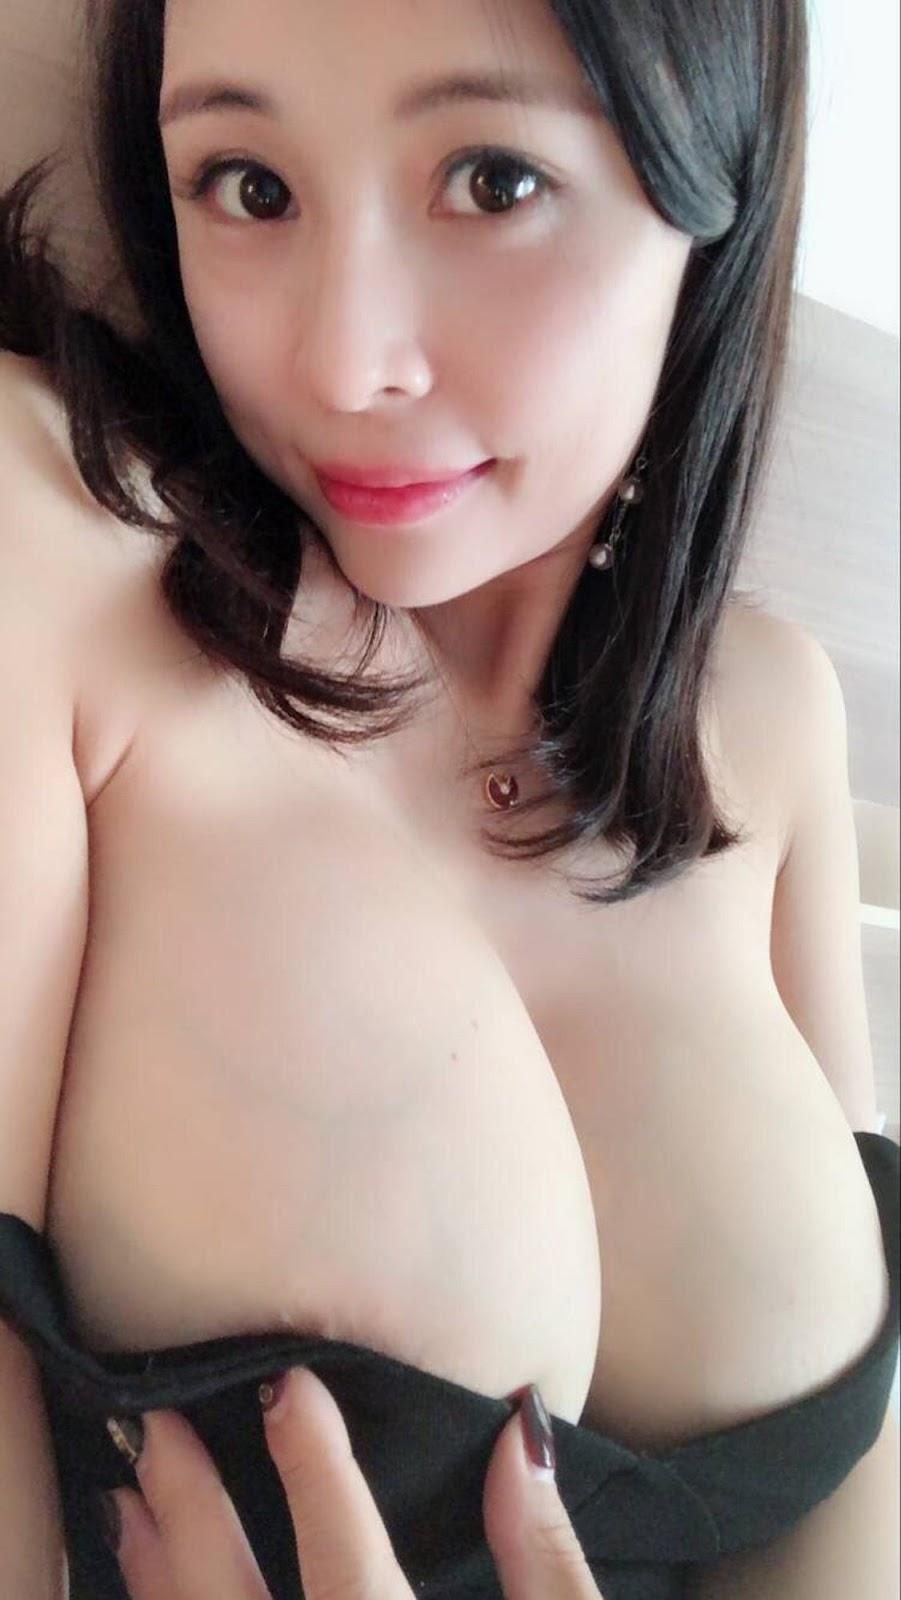 aHR0cHM6Ly93d3cubXlteXBpYy5uZXQvZGF0YS9hdHRhY2htZW50L2ZvcnVtLzIwMTkwOC8yMC8wODM0NDFhZDAxZWtqZGV2ZGpqYXowLmpwZy50aHVtYi5qcGc%253D - 成都瓶儿 - Chengdu Pinger big tits selfie nude 2020